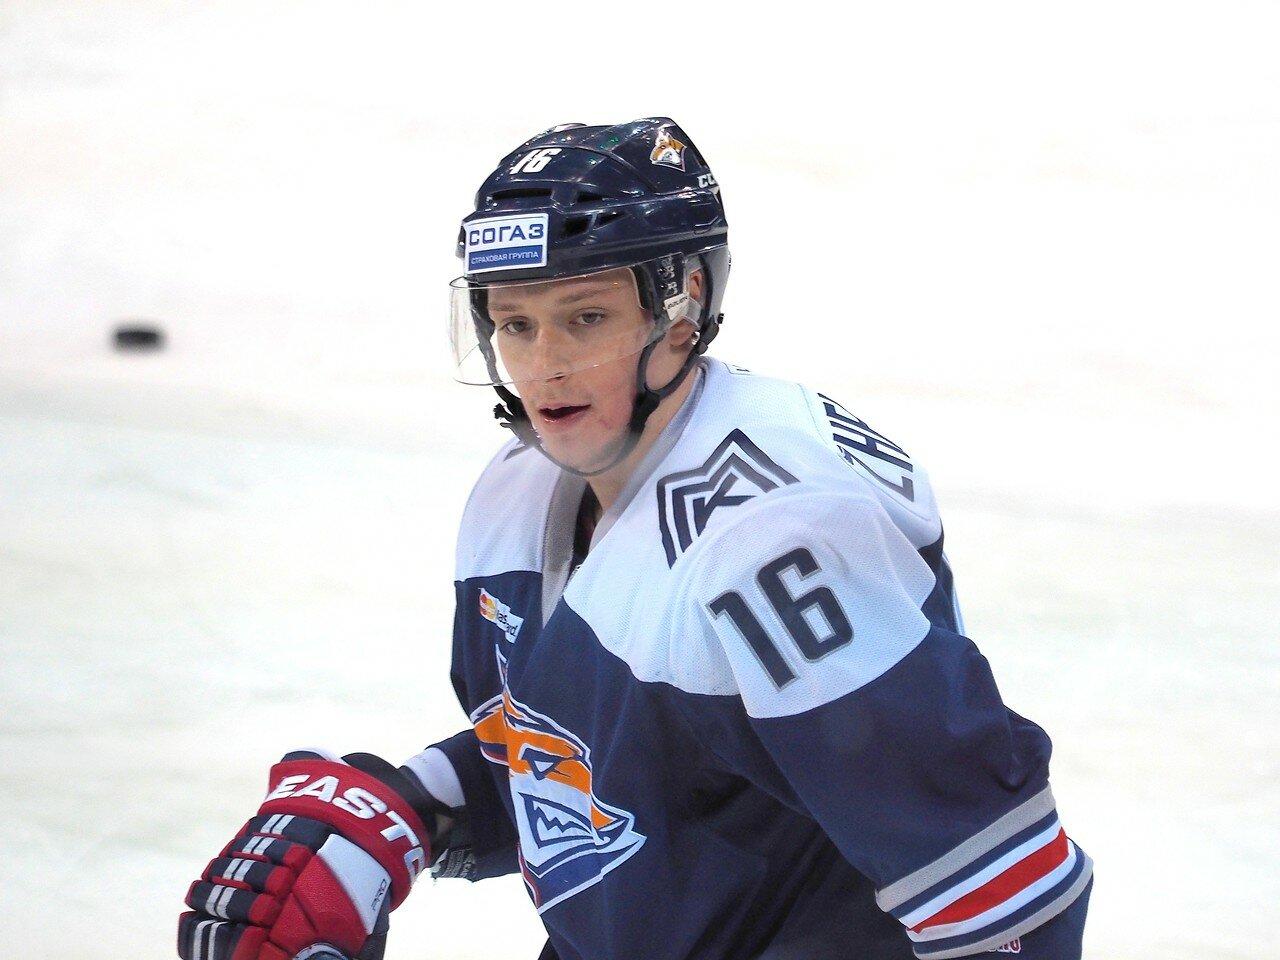 39Плей-офф 2016 Восток 1/2 Металлург - Сибирь 16.03.2016